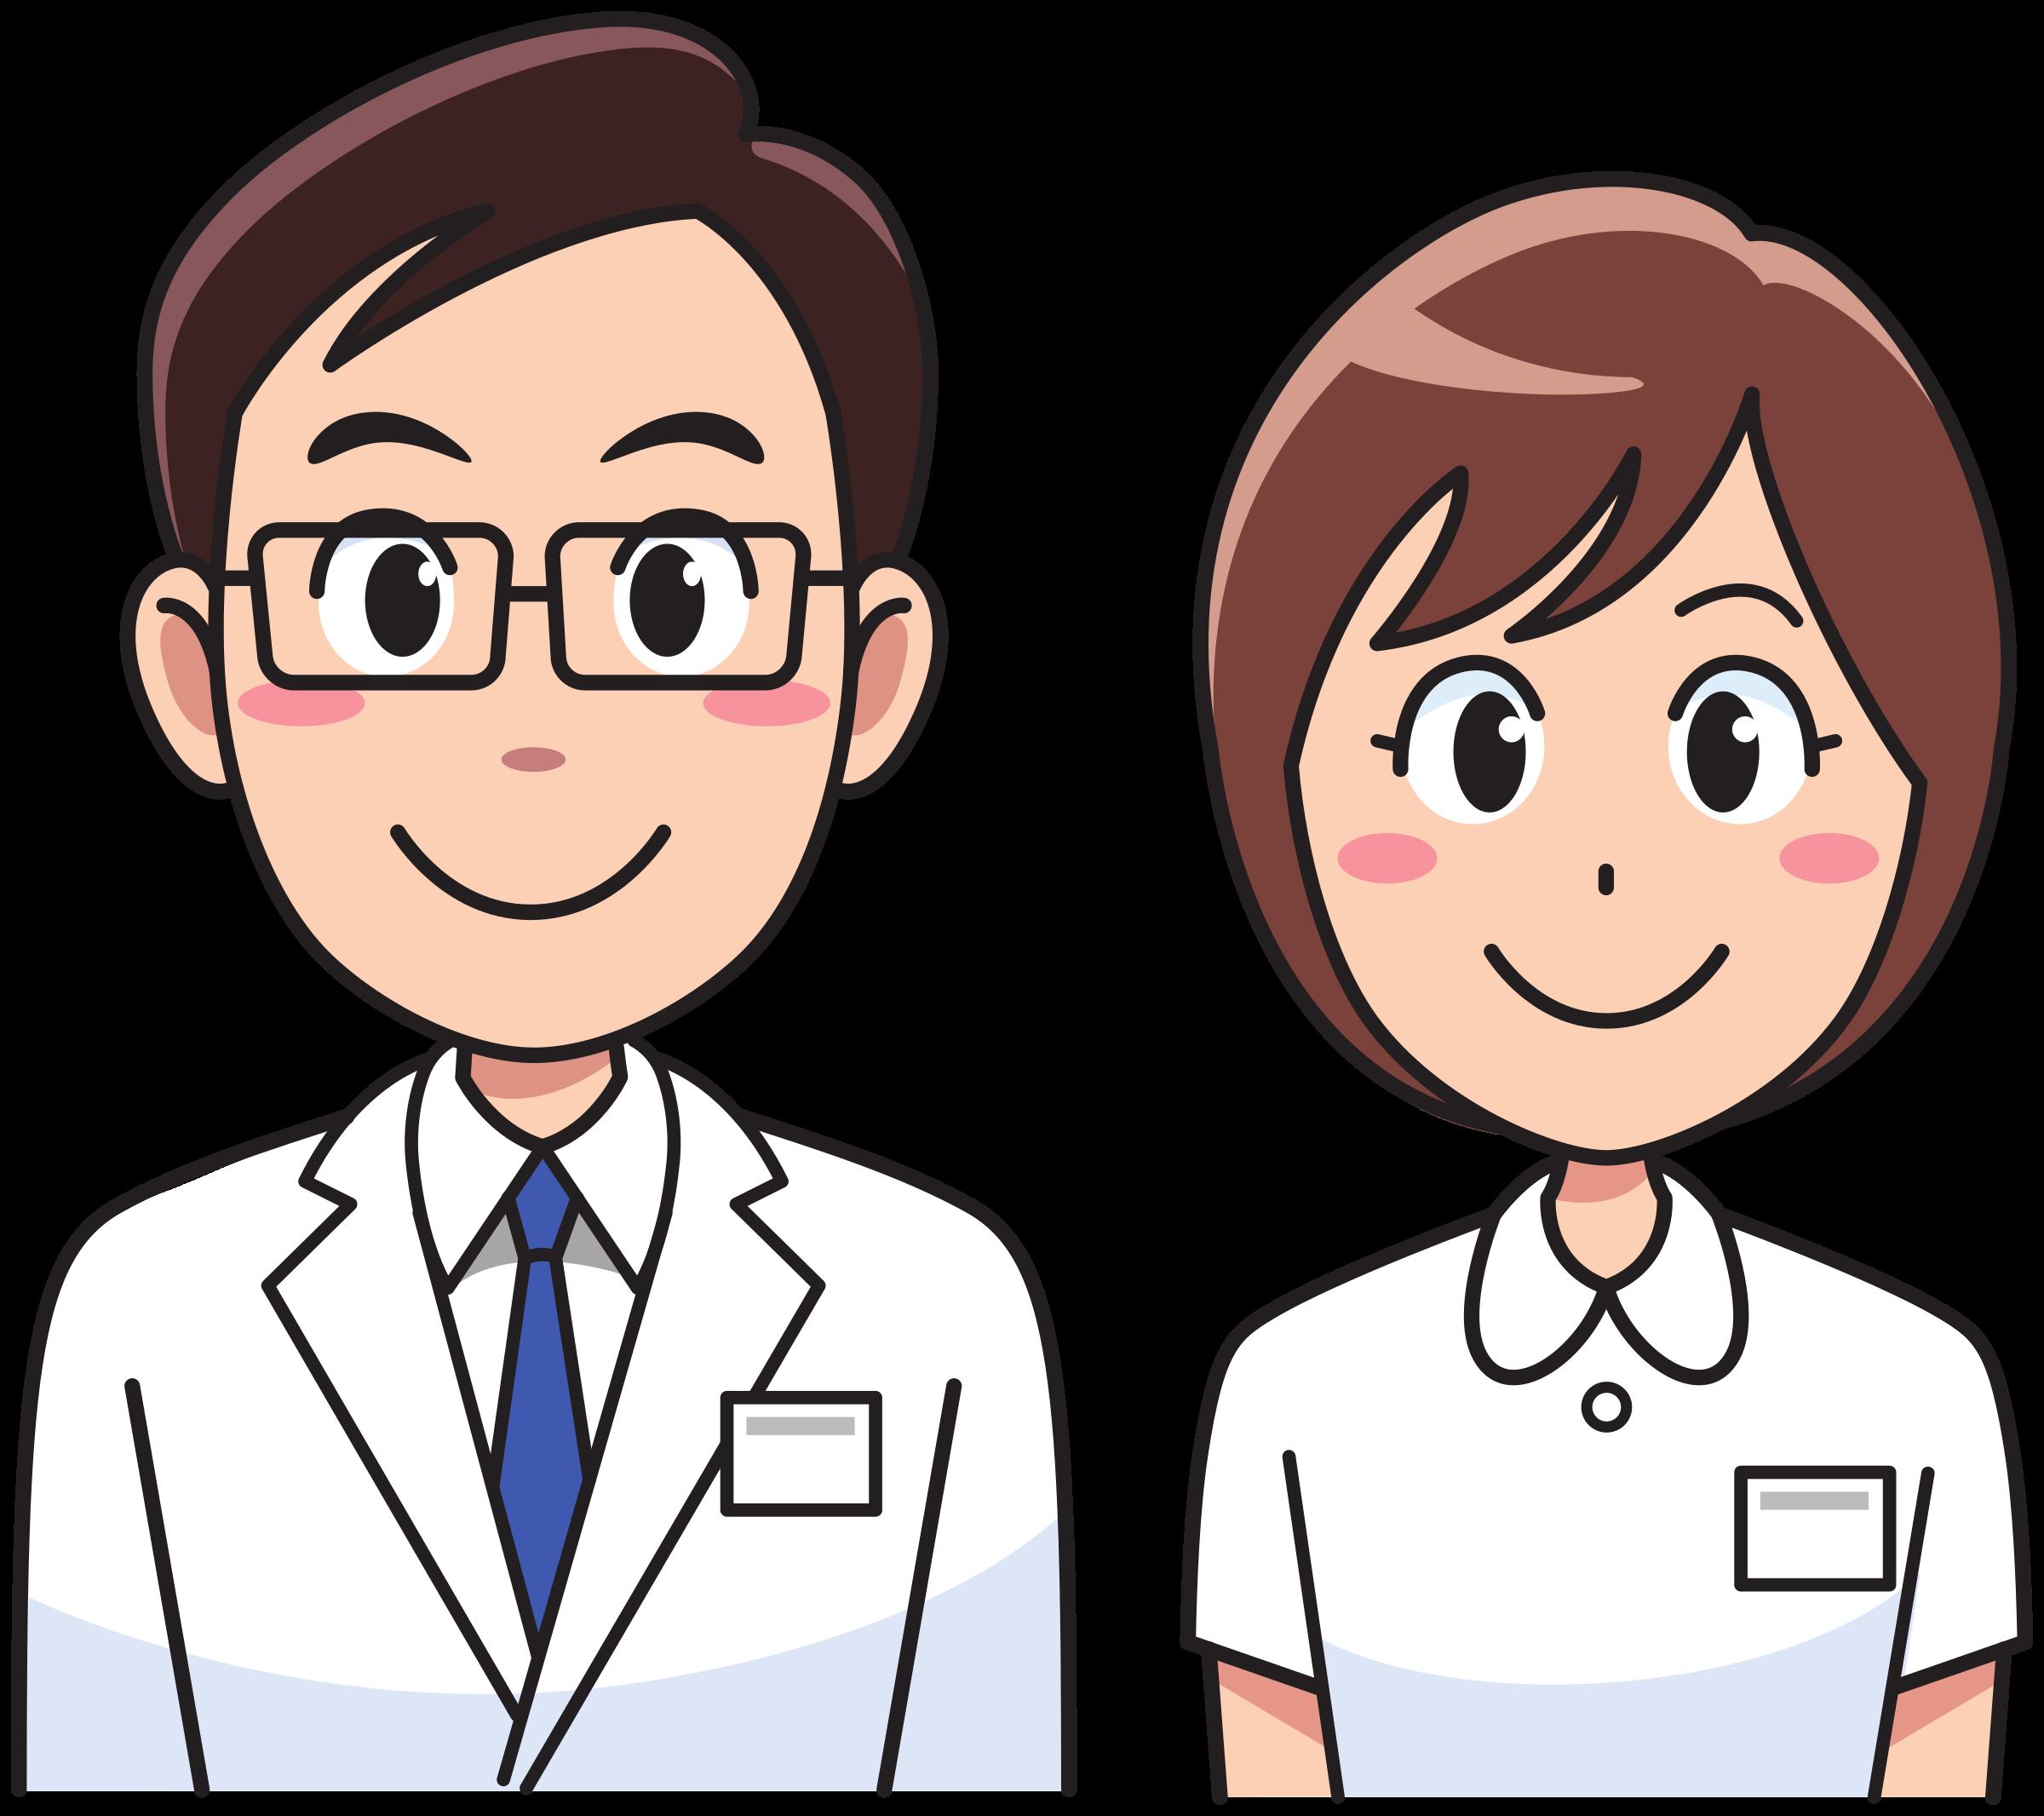 Doctor clipart cute. Medicine and nurse big